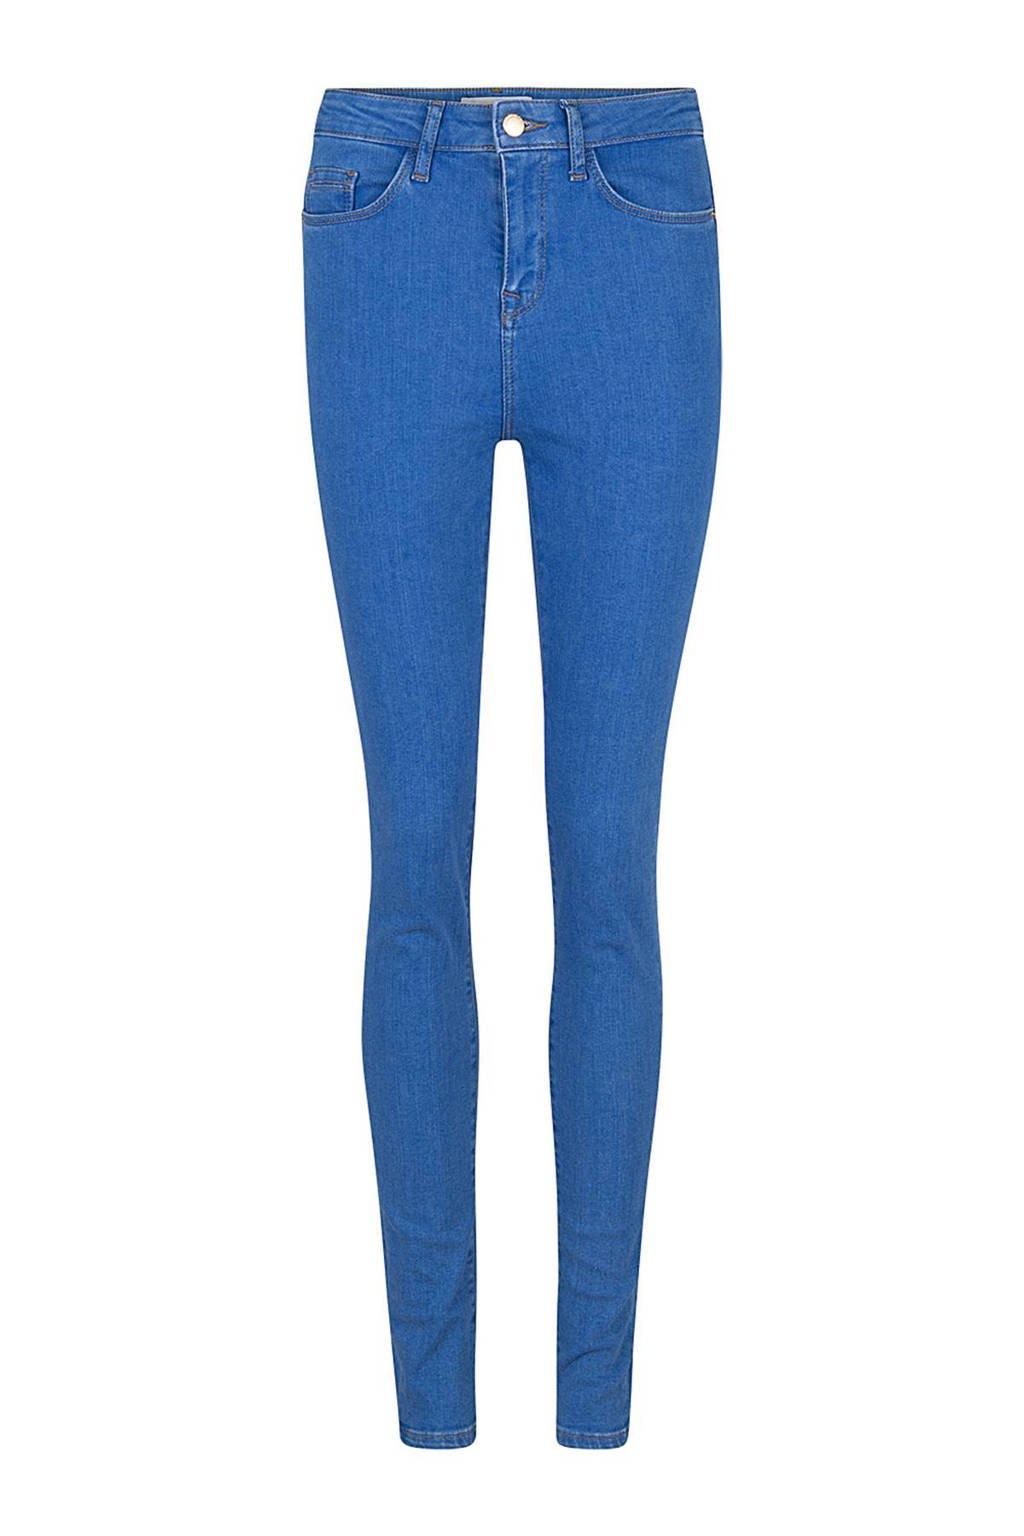 WE Fashion Blue Ridge high waisted skinny fit jeans, Helder blauw